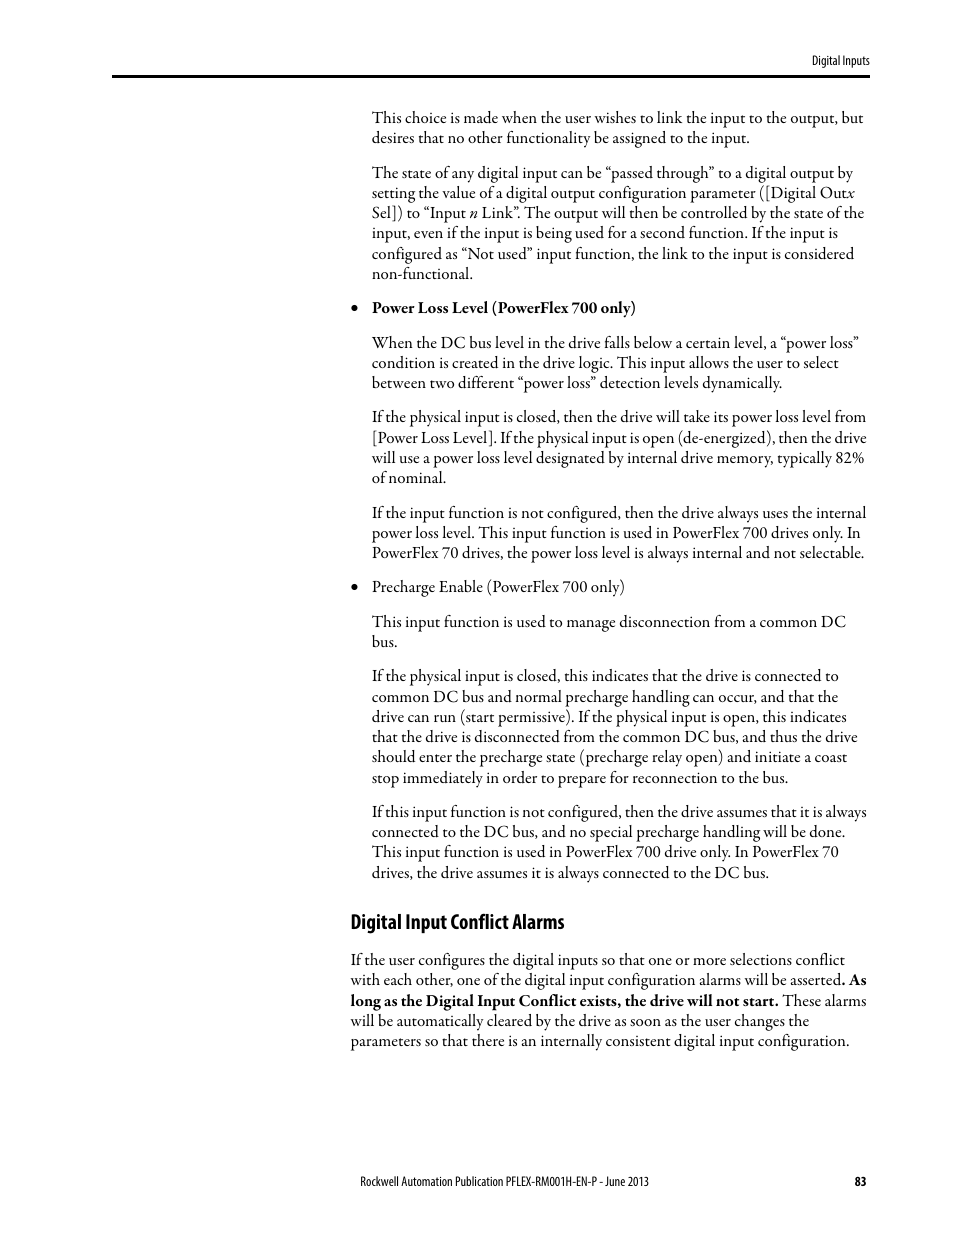 Digital input conflict alarms | Rockwell Automation 20B PowerFlex 70